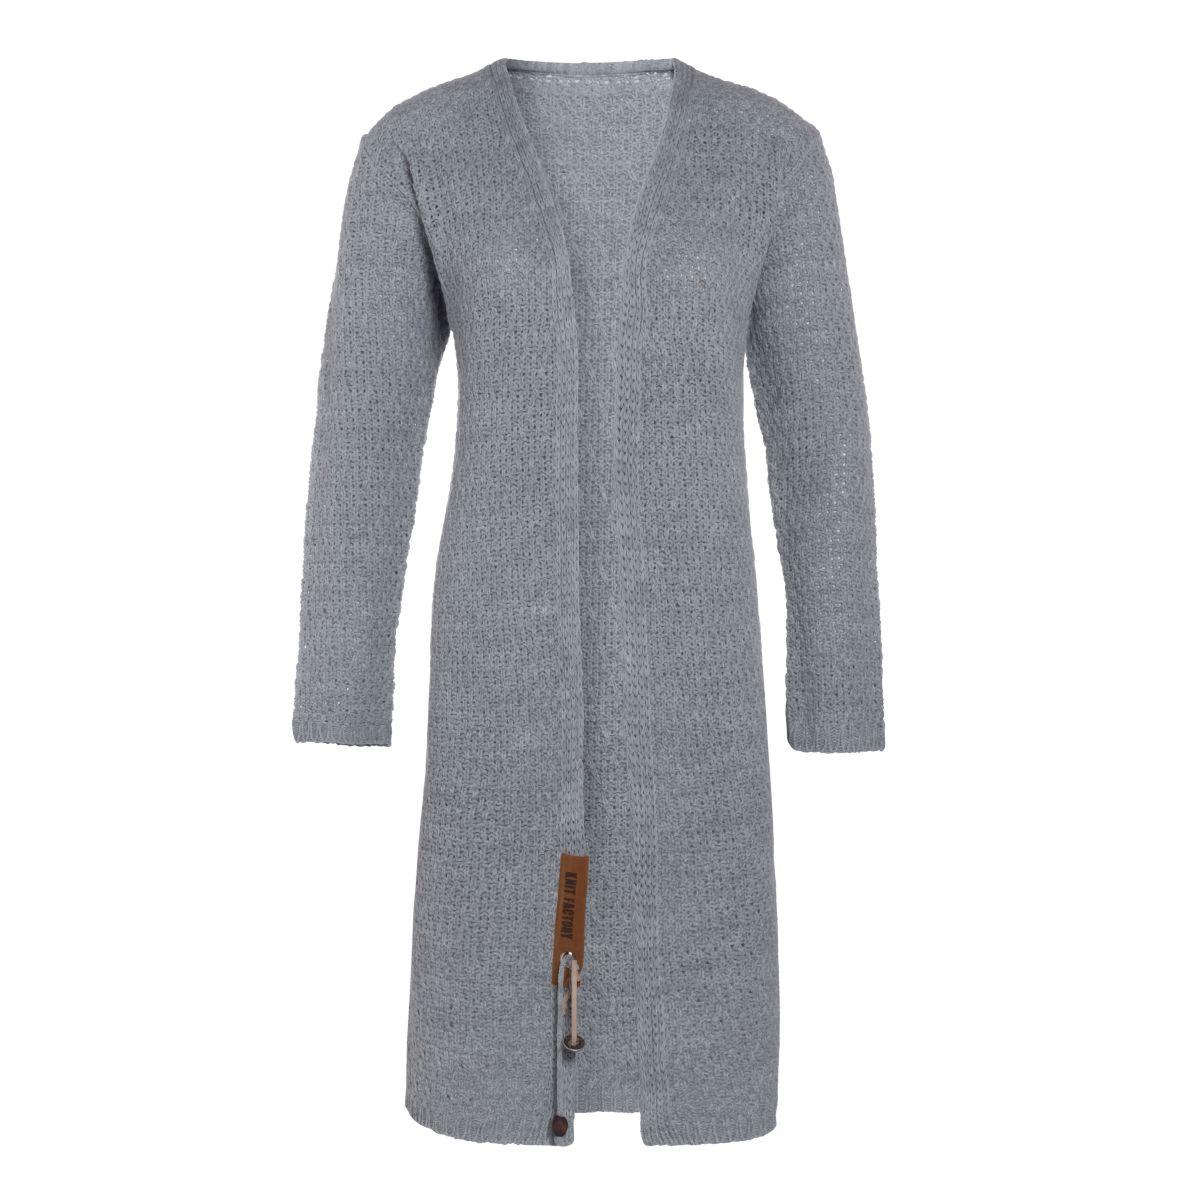 luna long knitted cardigan light grey 4042